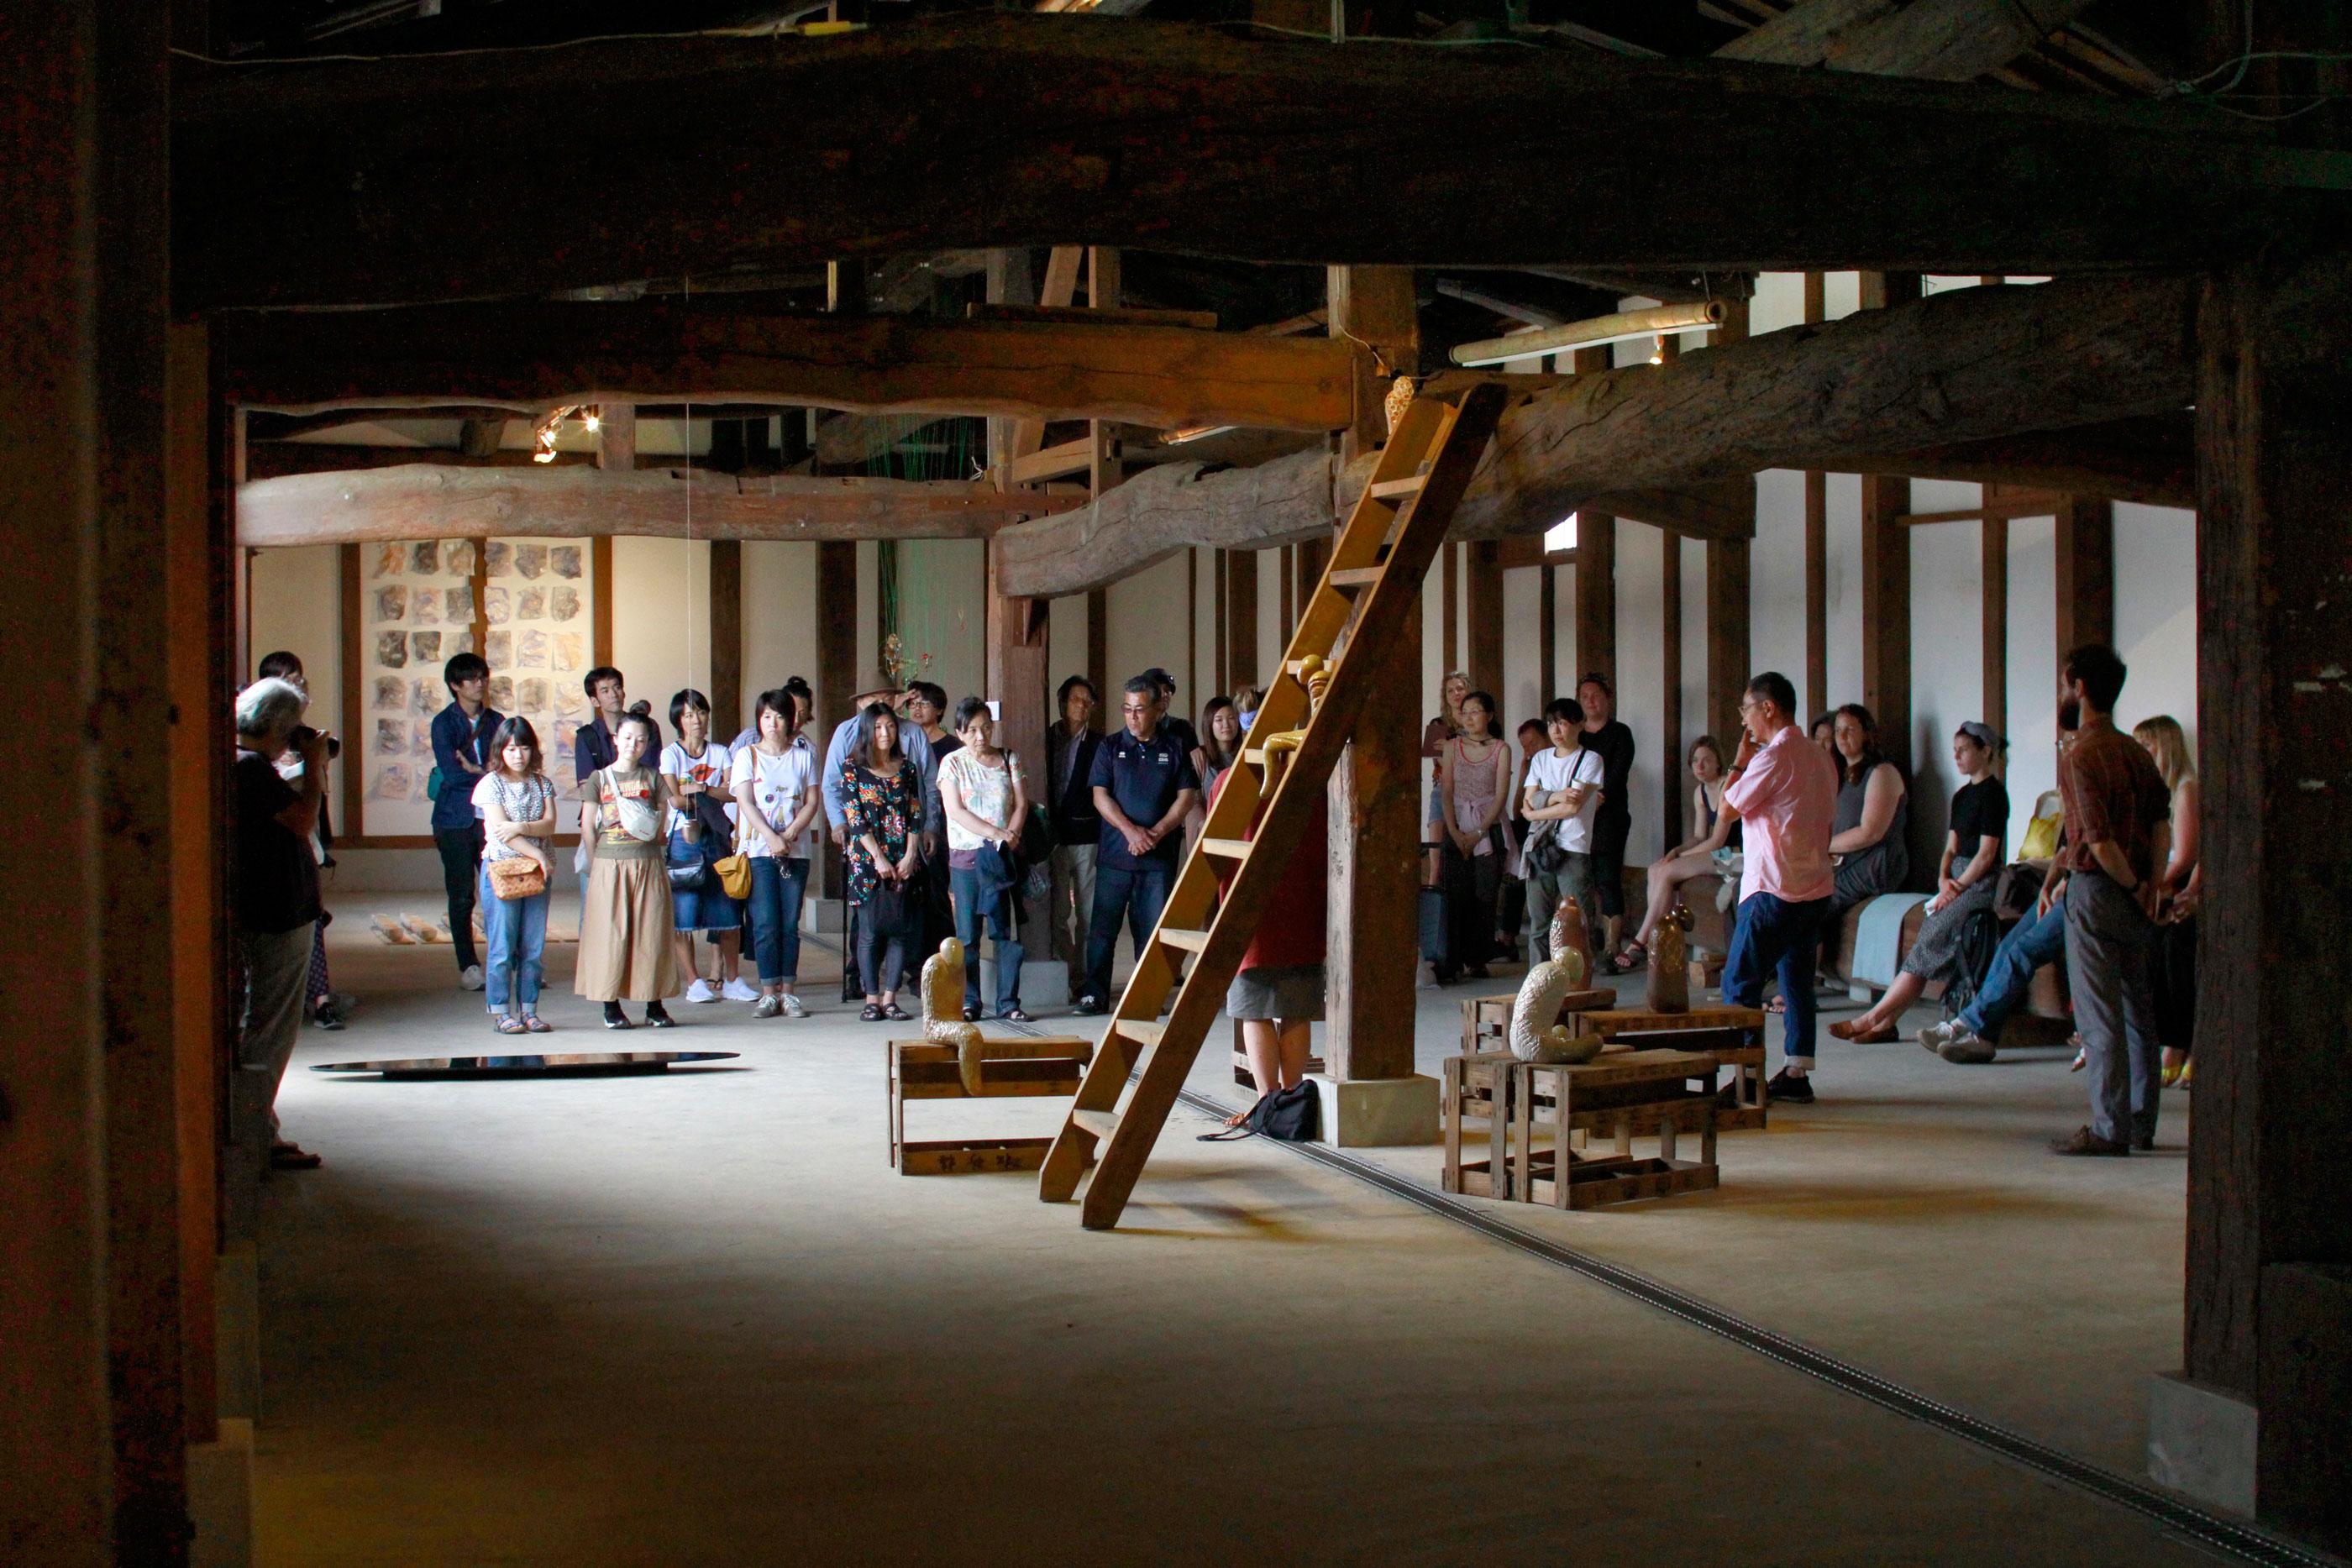 Japan Art Exhibition Shiro Oni Studio Art Residency シロオニスタジオの展覧会 2017 June Artist Talk